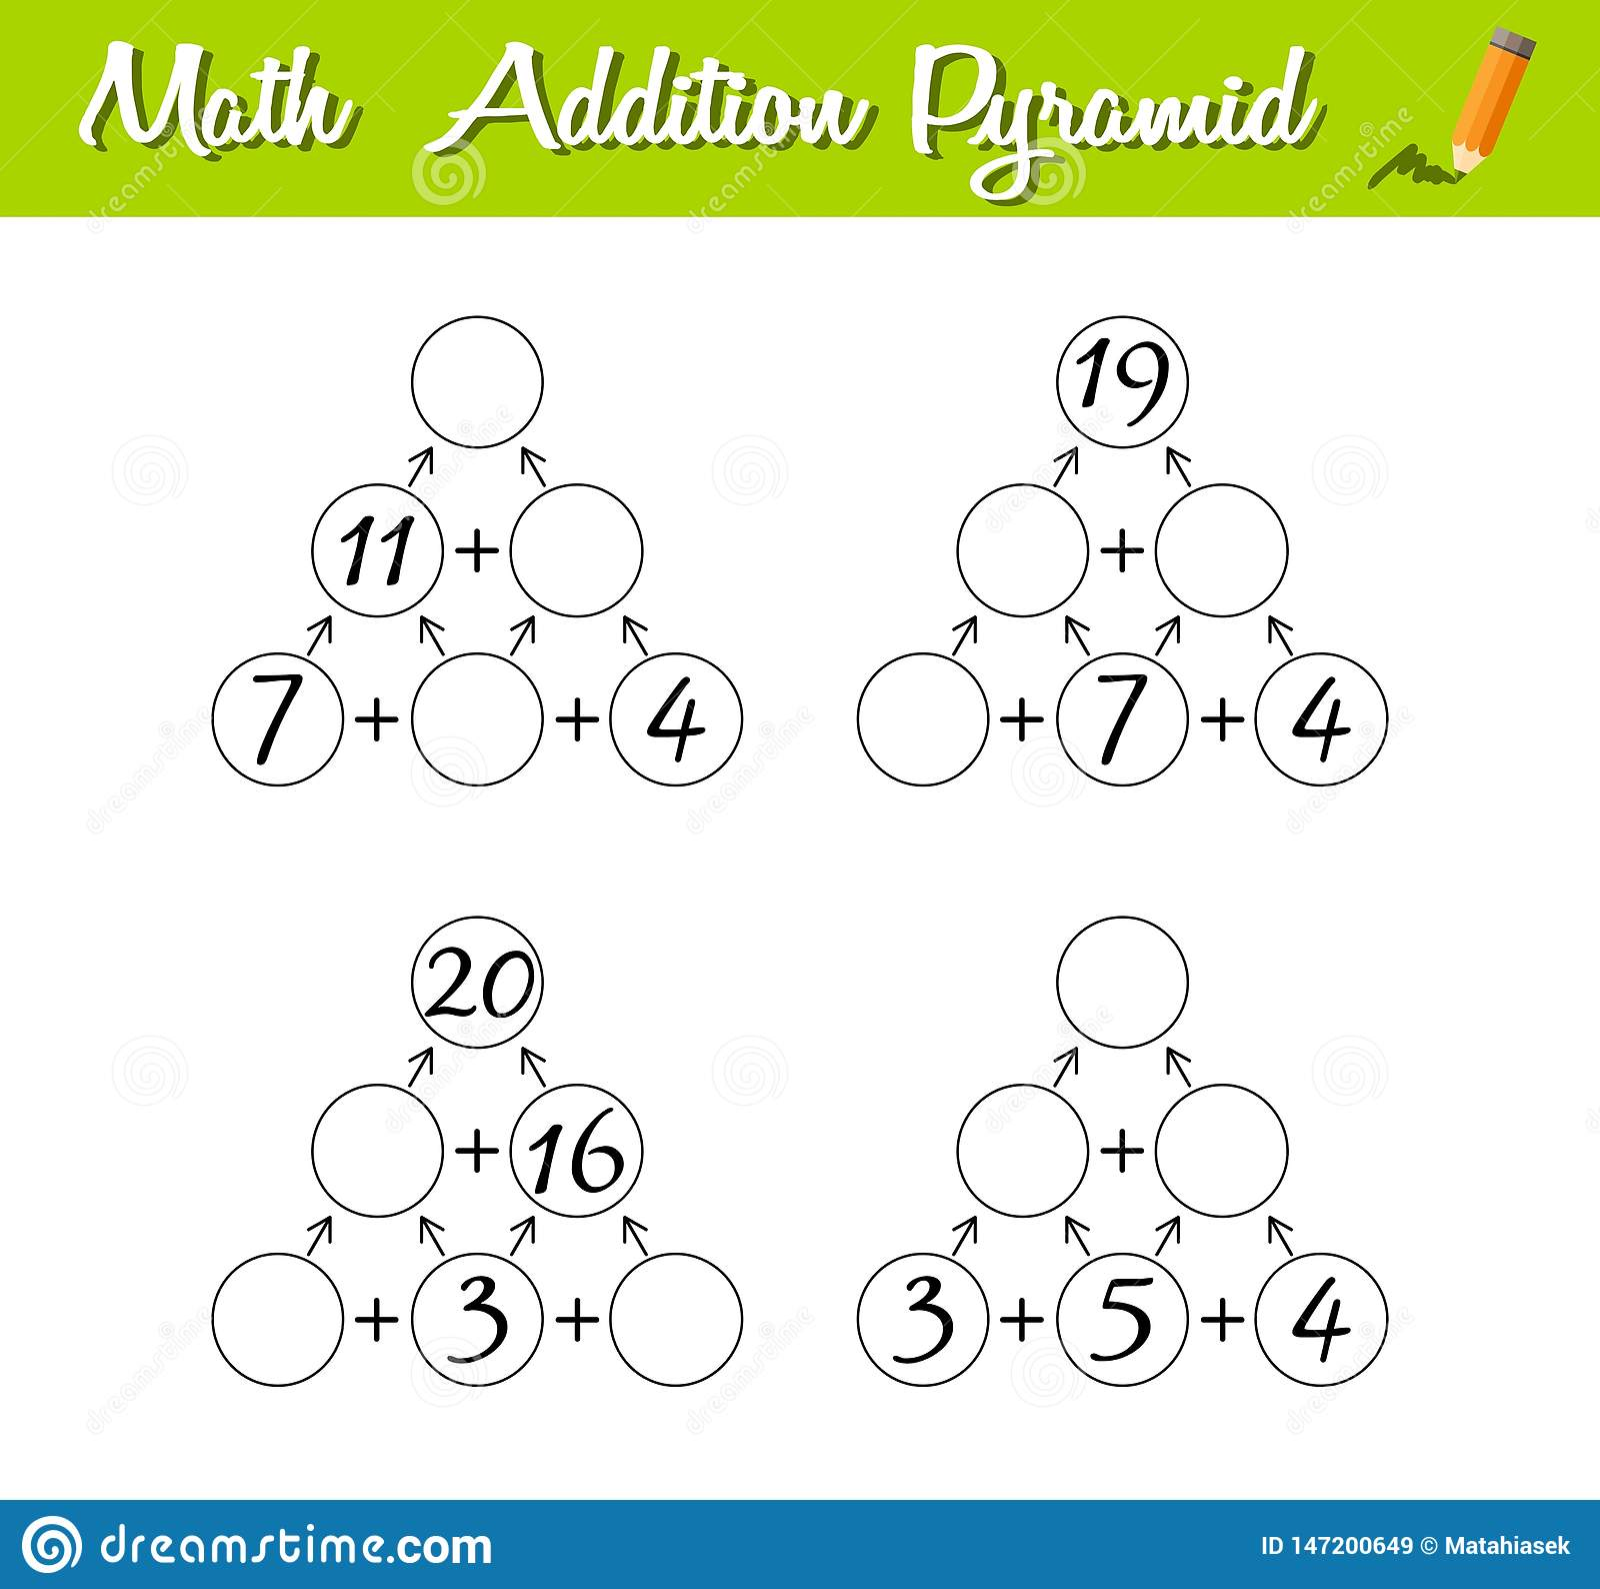 Math Pyramid Game Educational A Mathematical Game